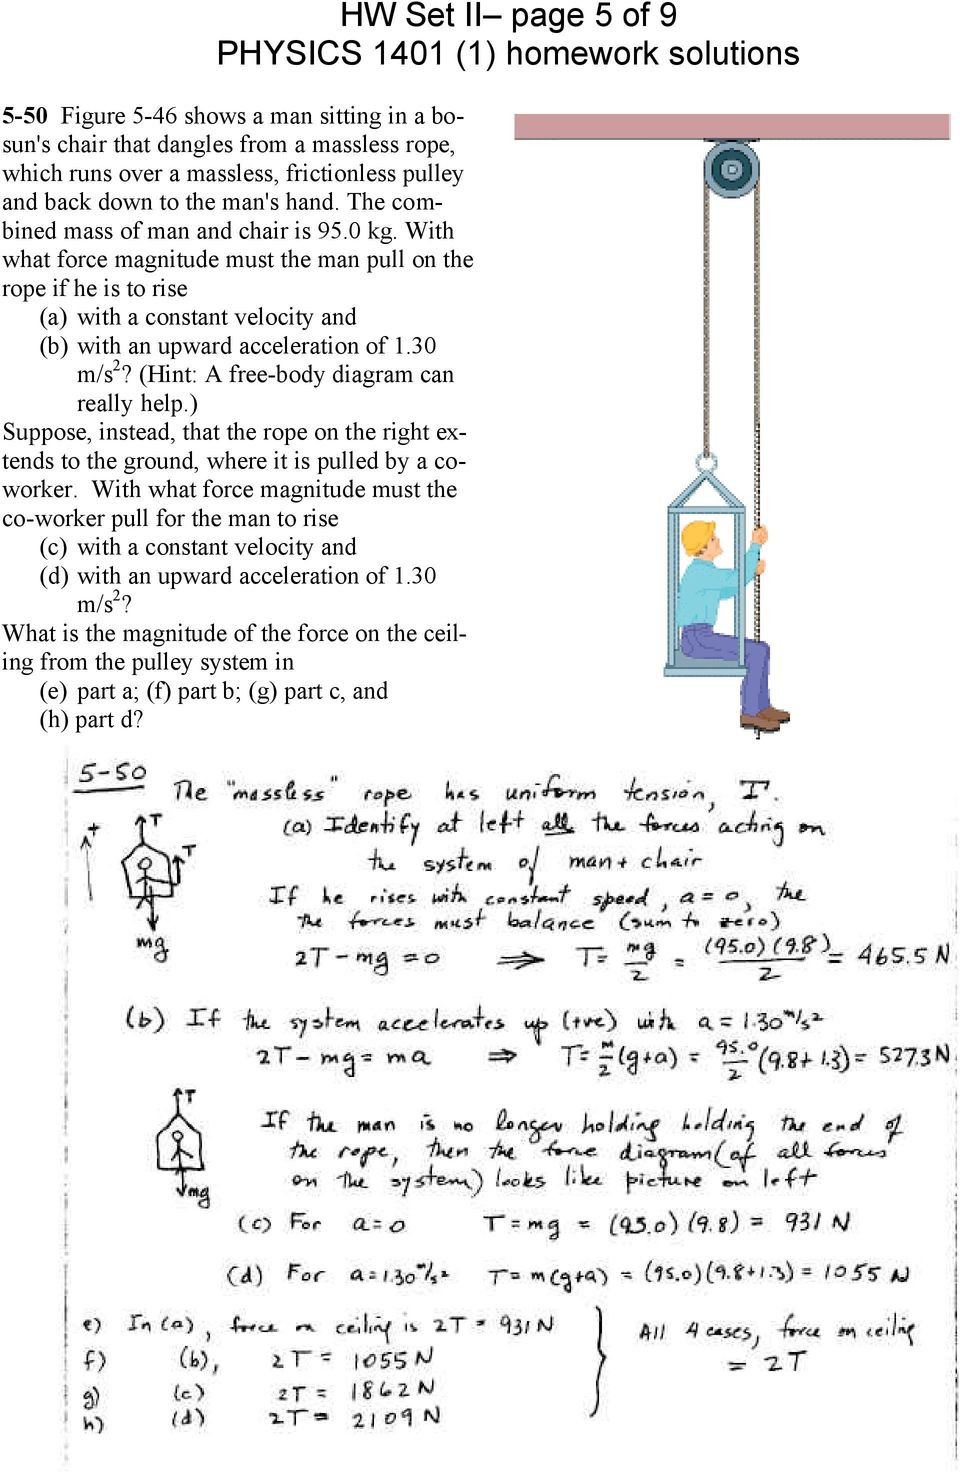 Free Body Diagram Worksheet Answers Ka 5783] Unbalanced force Diagram Free Body Diagram Man